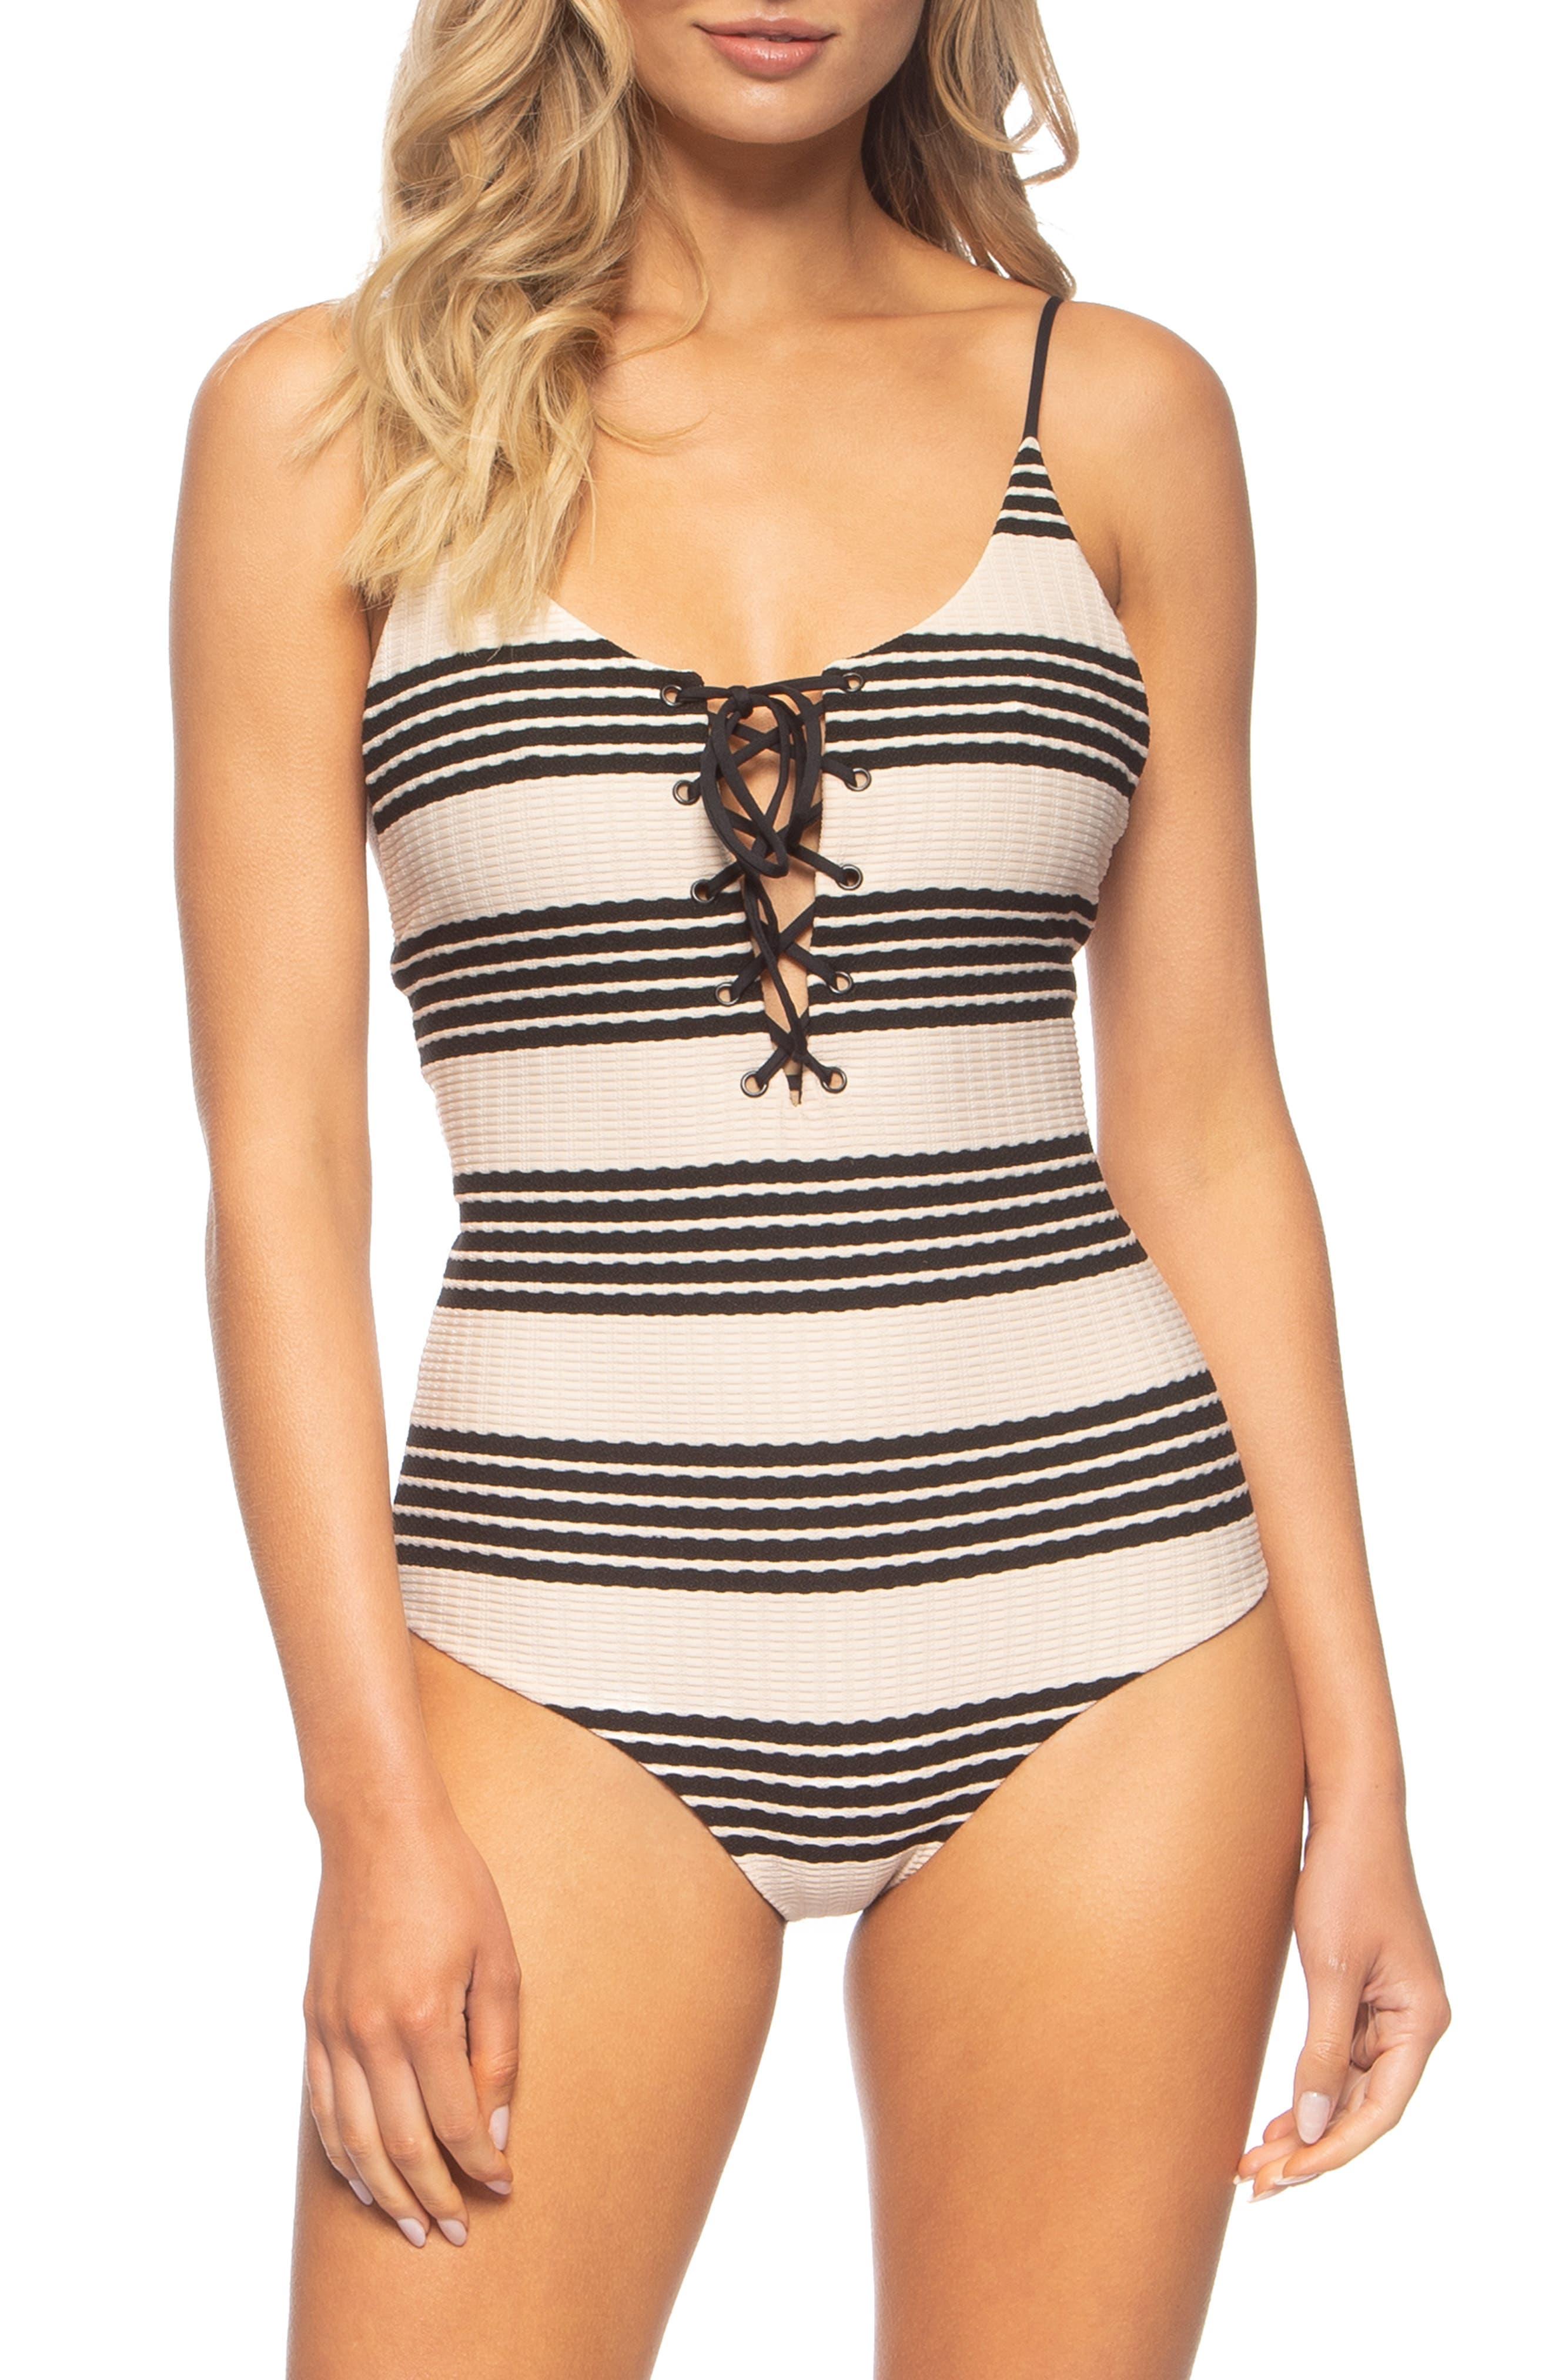 TAVIK, Monahan One-Piece Swimsuit, Main thumbnail 1, color, SEASHELL/ BLACK